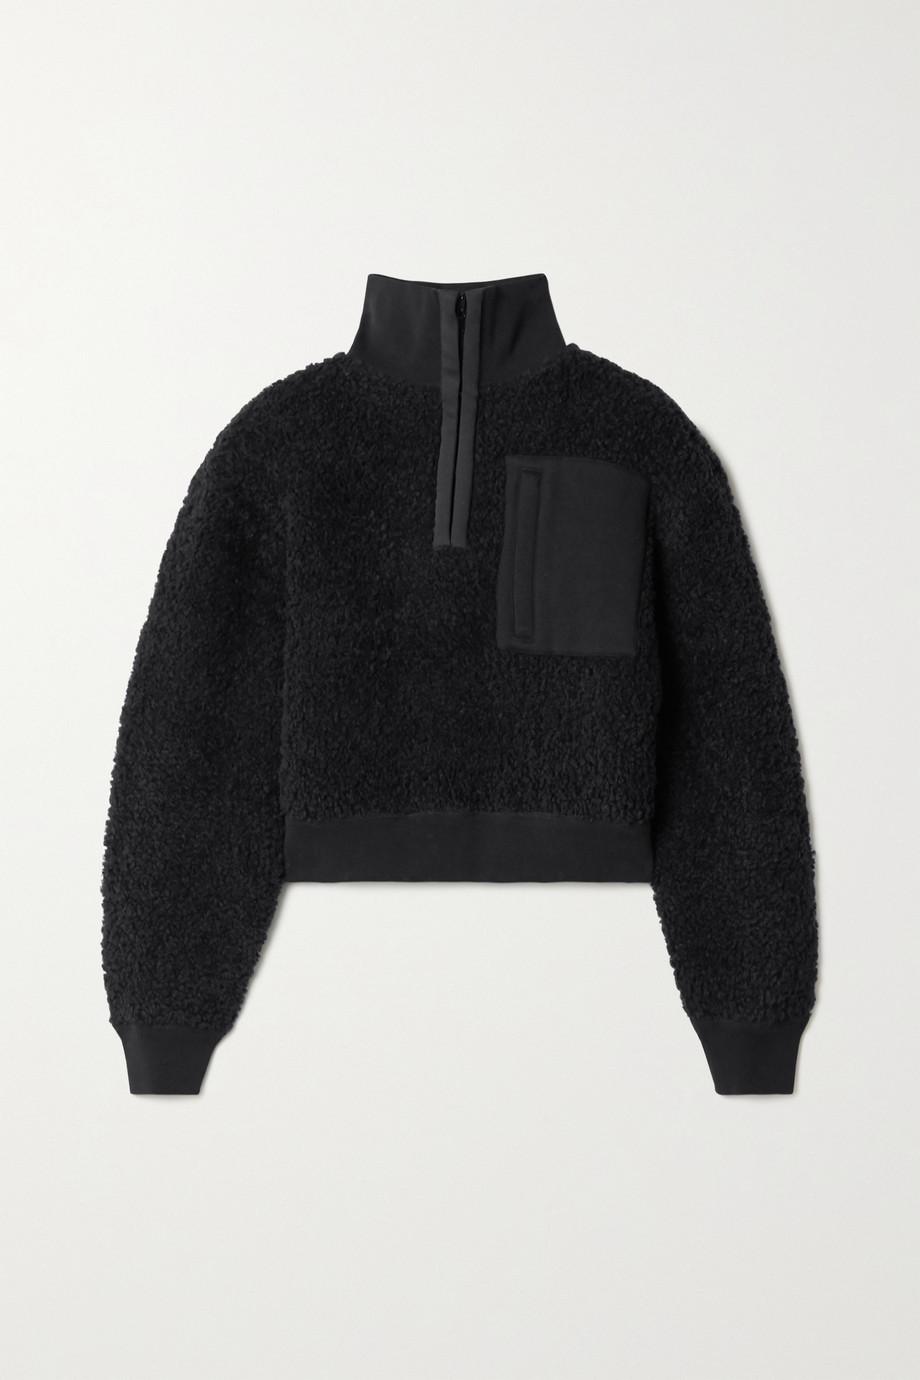 alexanderwang.t Oversized wool-blend fleece sweatshirt